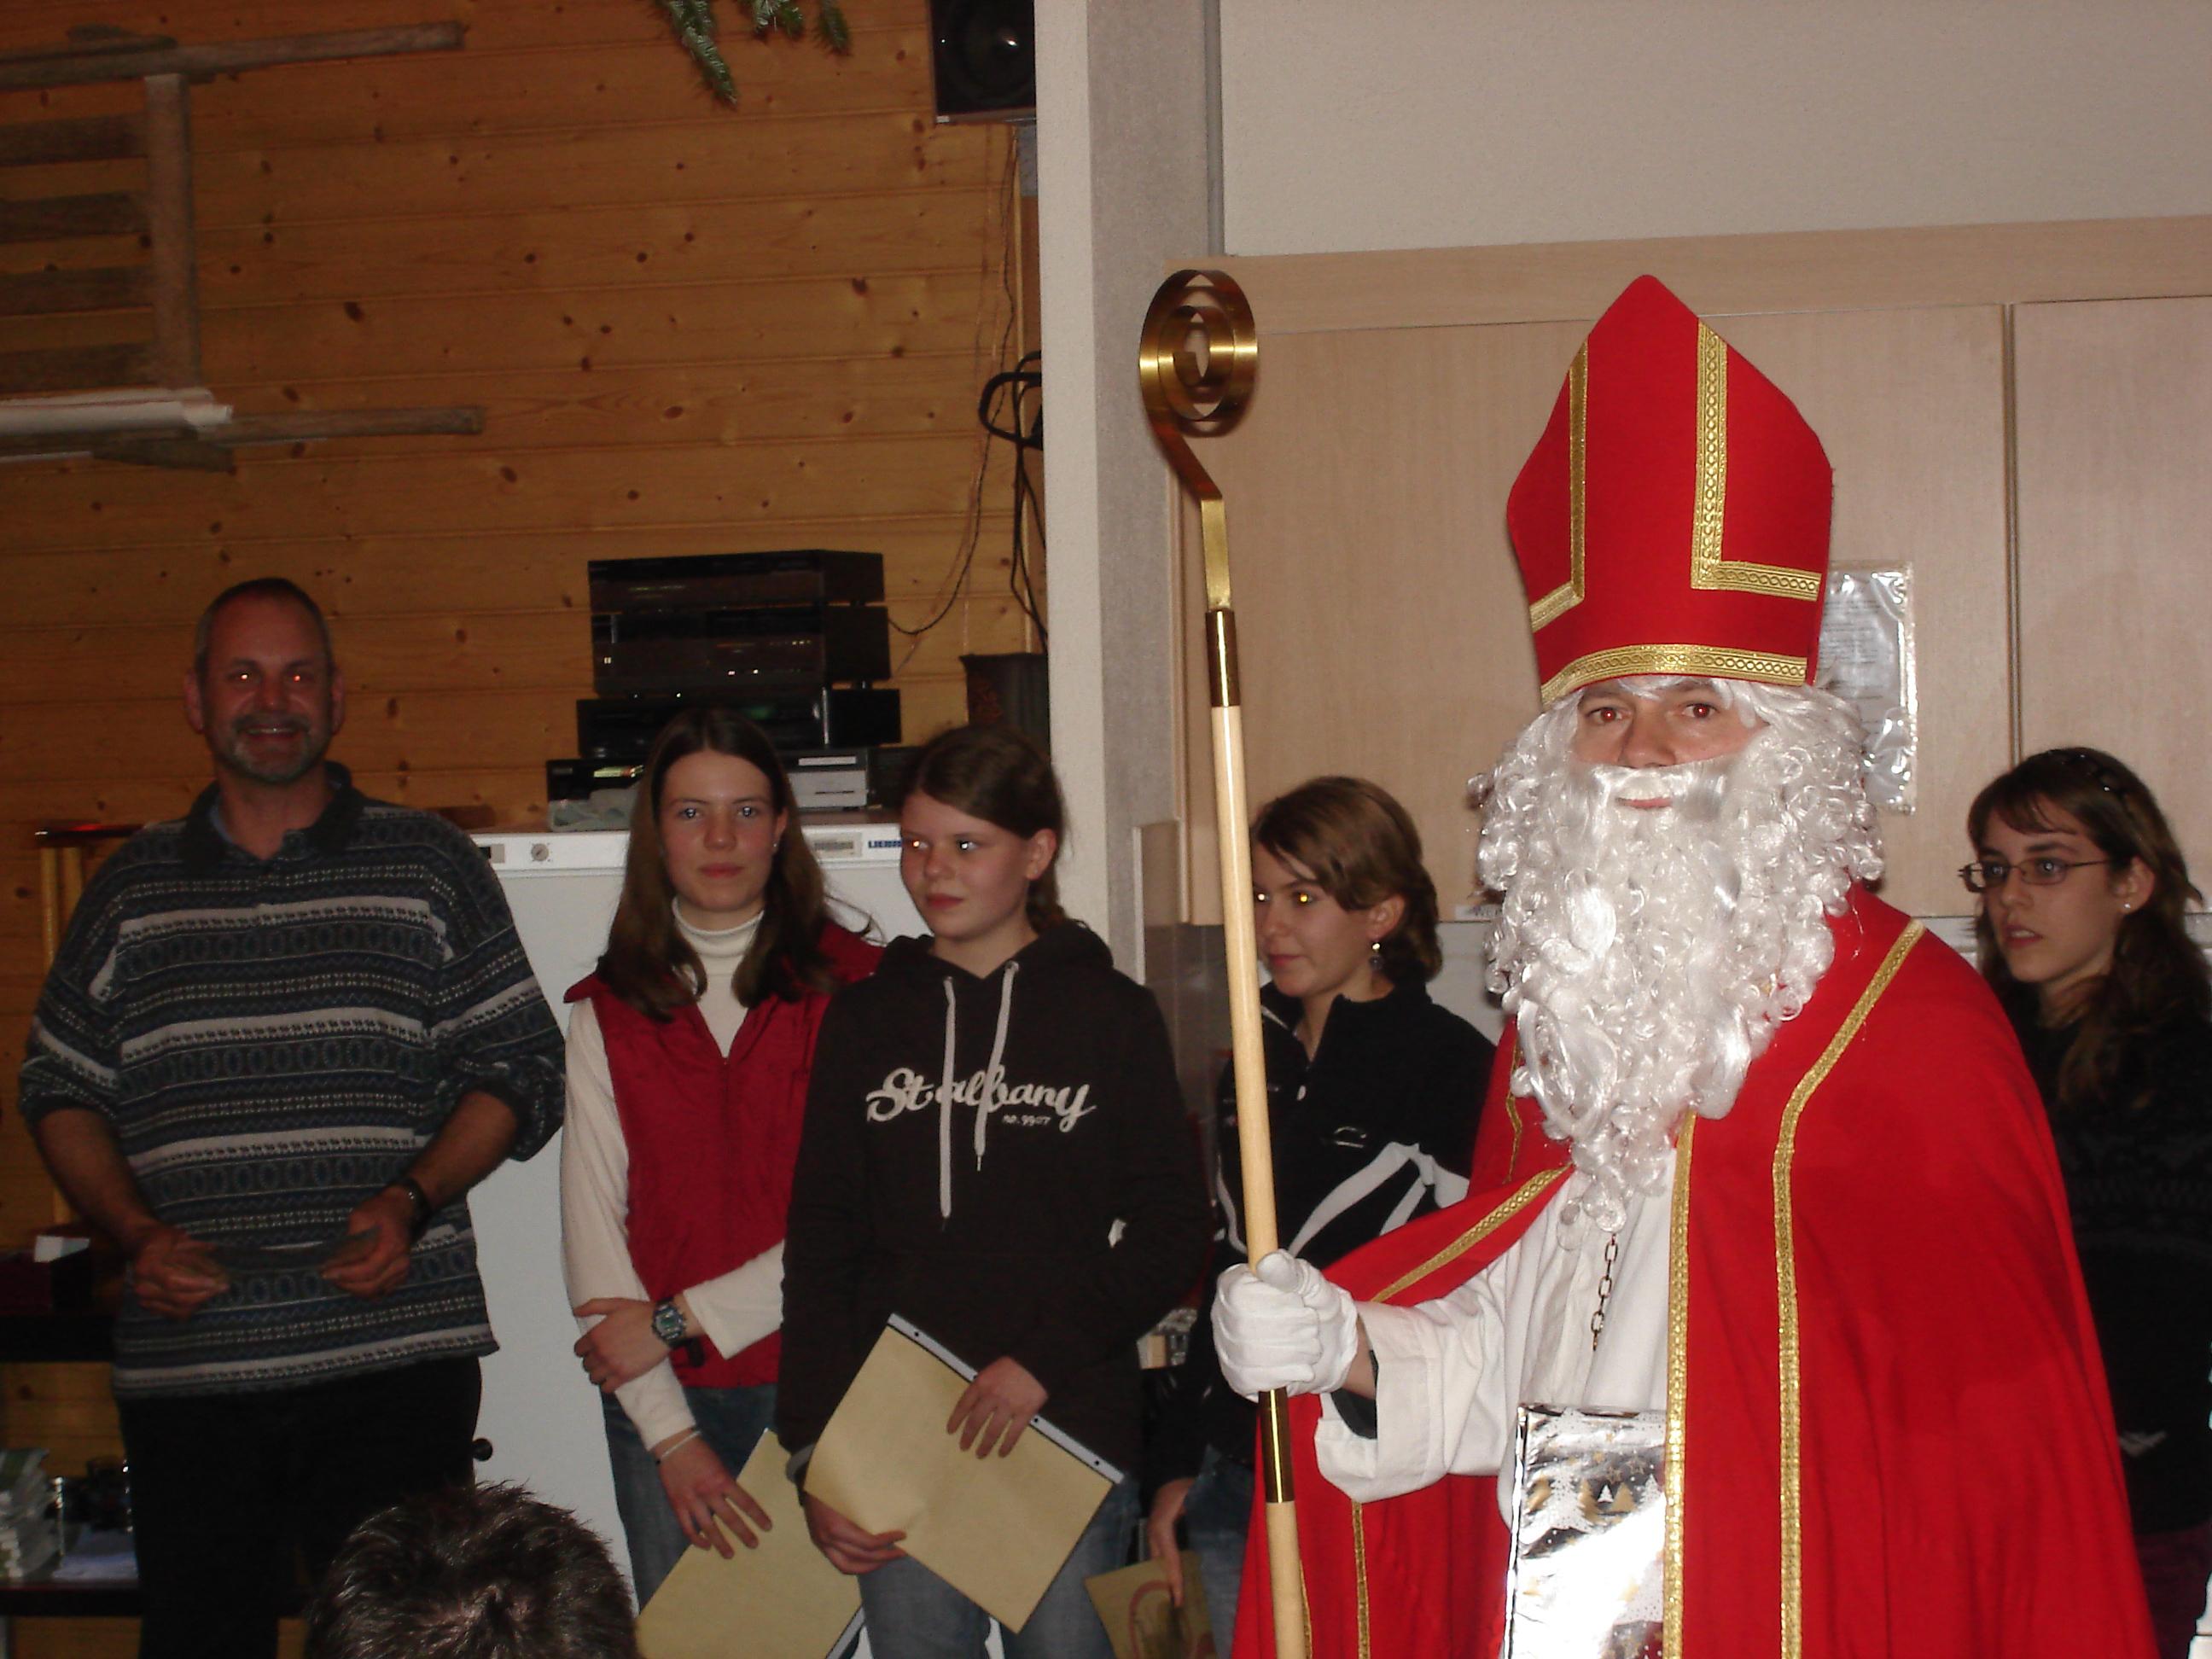 Bott 2008 Fridau